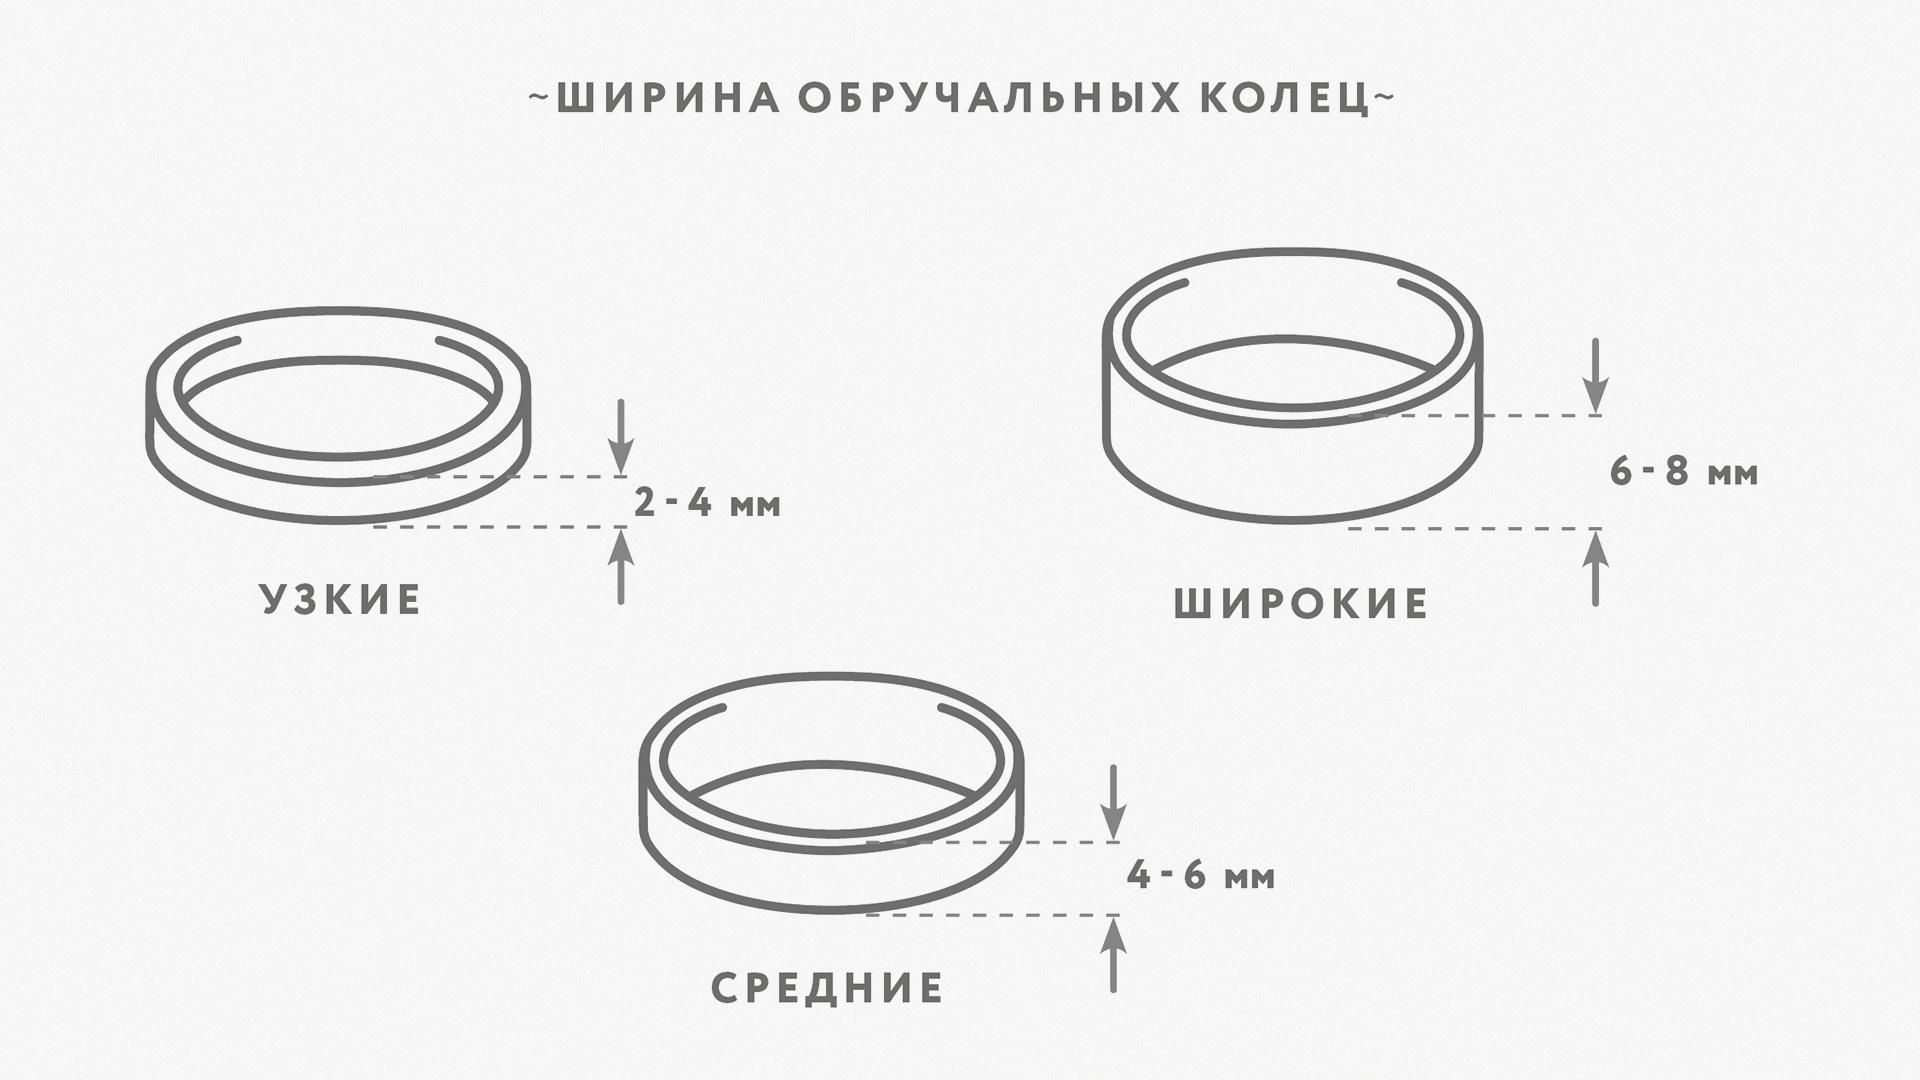 Таблица размеров колец